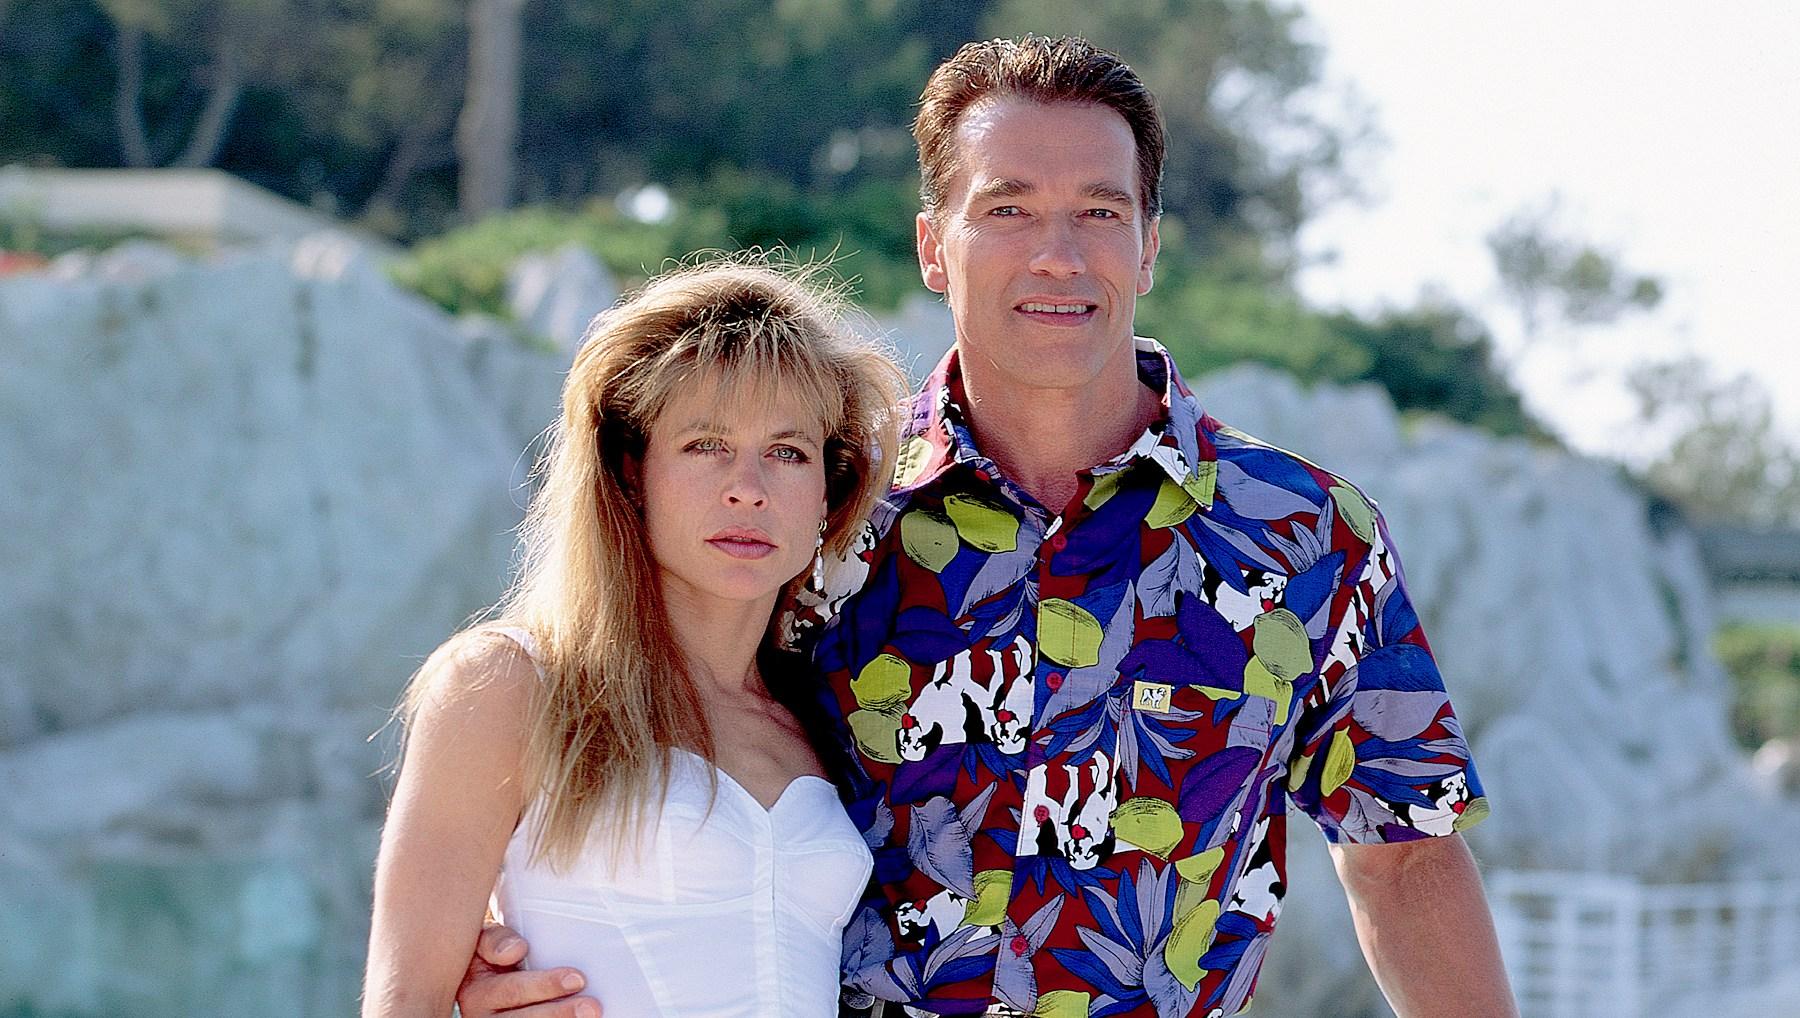 Arnold-Schwarzenegger-Linda-Hamilton-Terminator